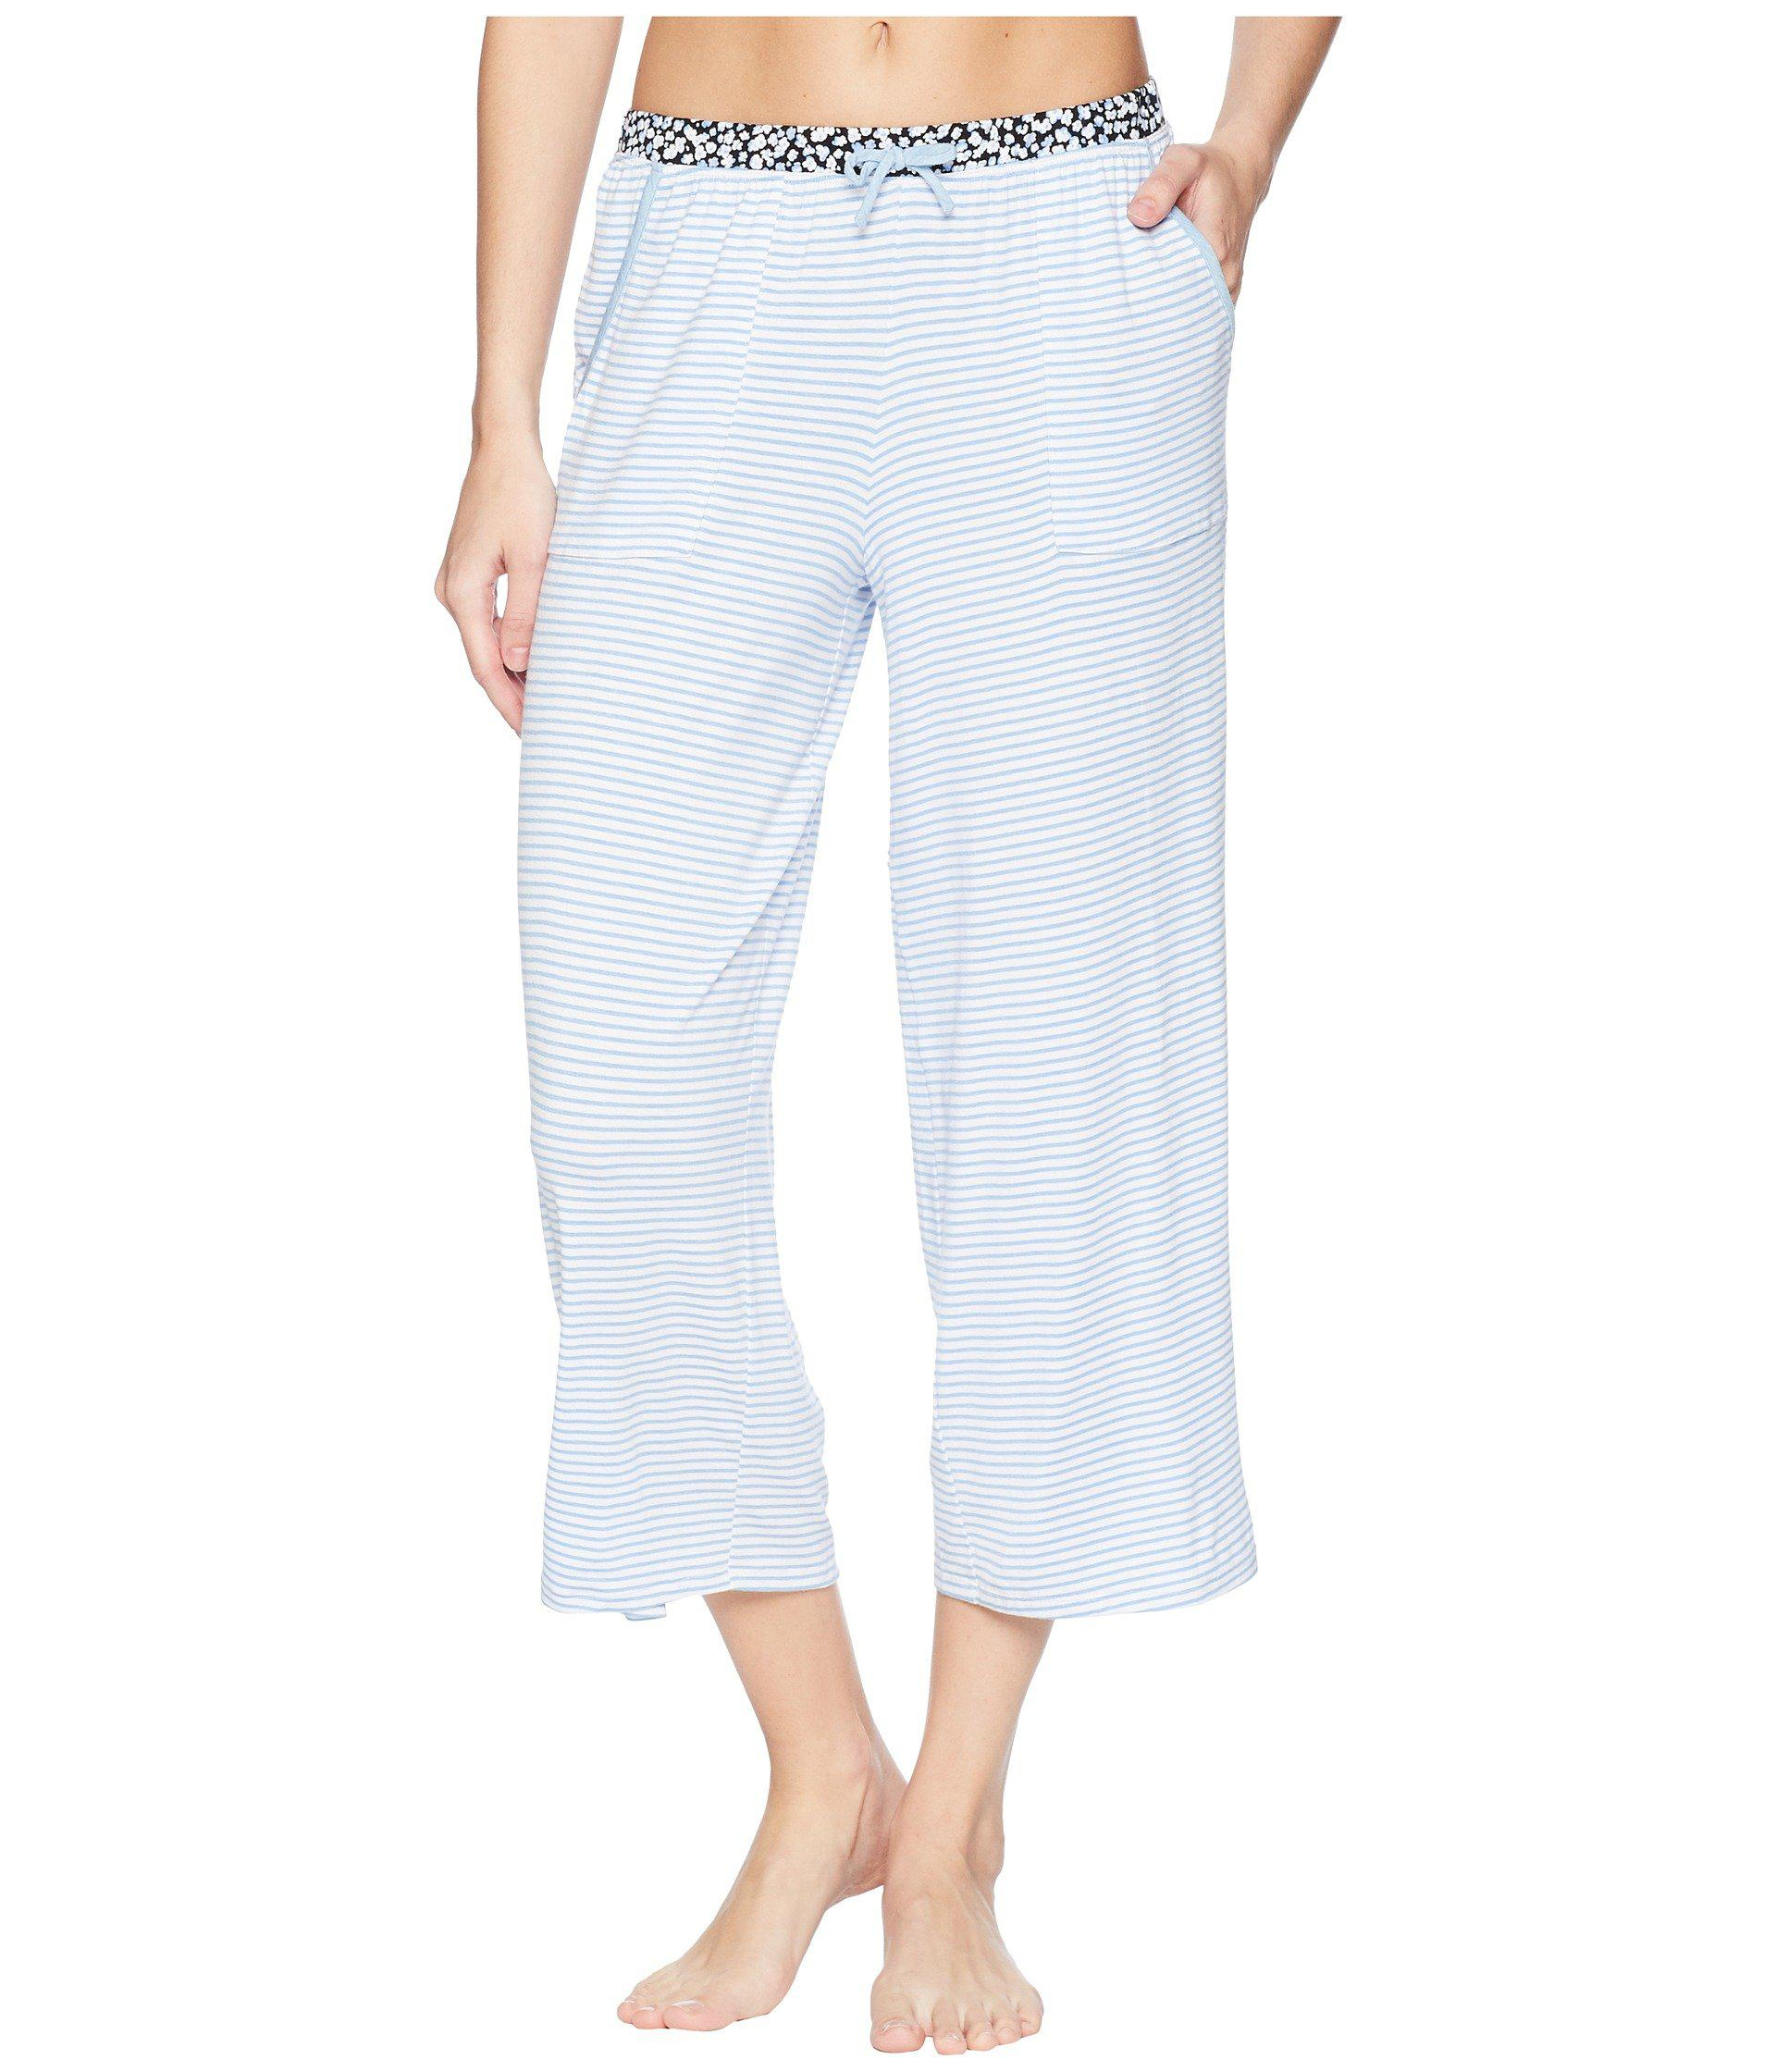 Jockey Womens Double Knit Stripe Jogger Pant Pajama Bottom